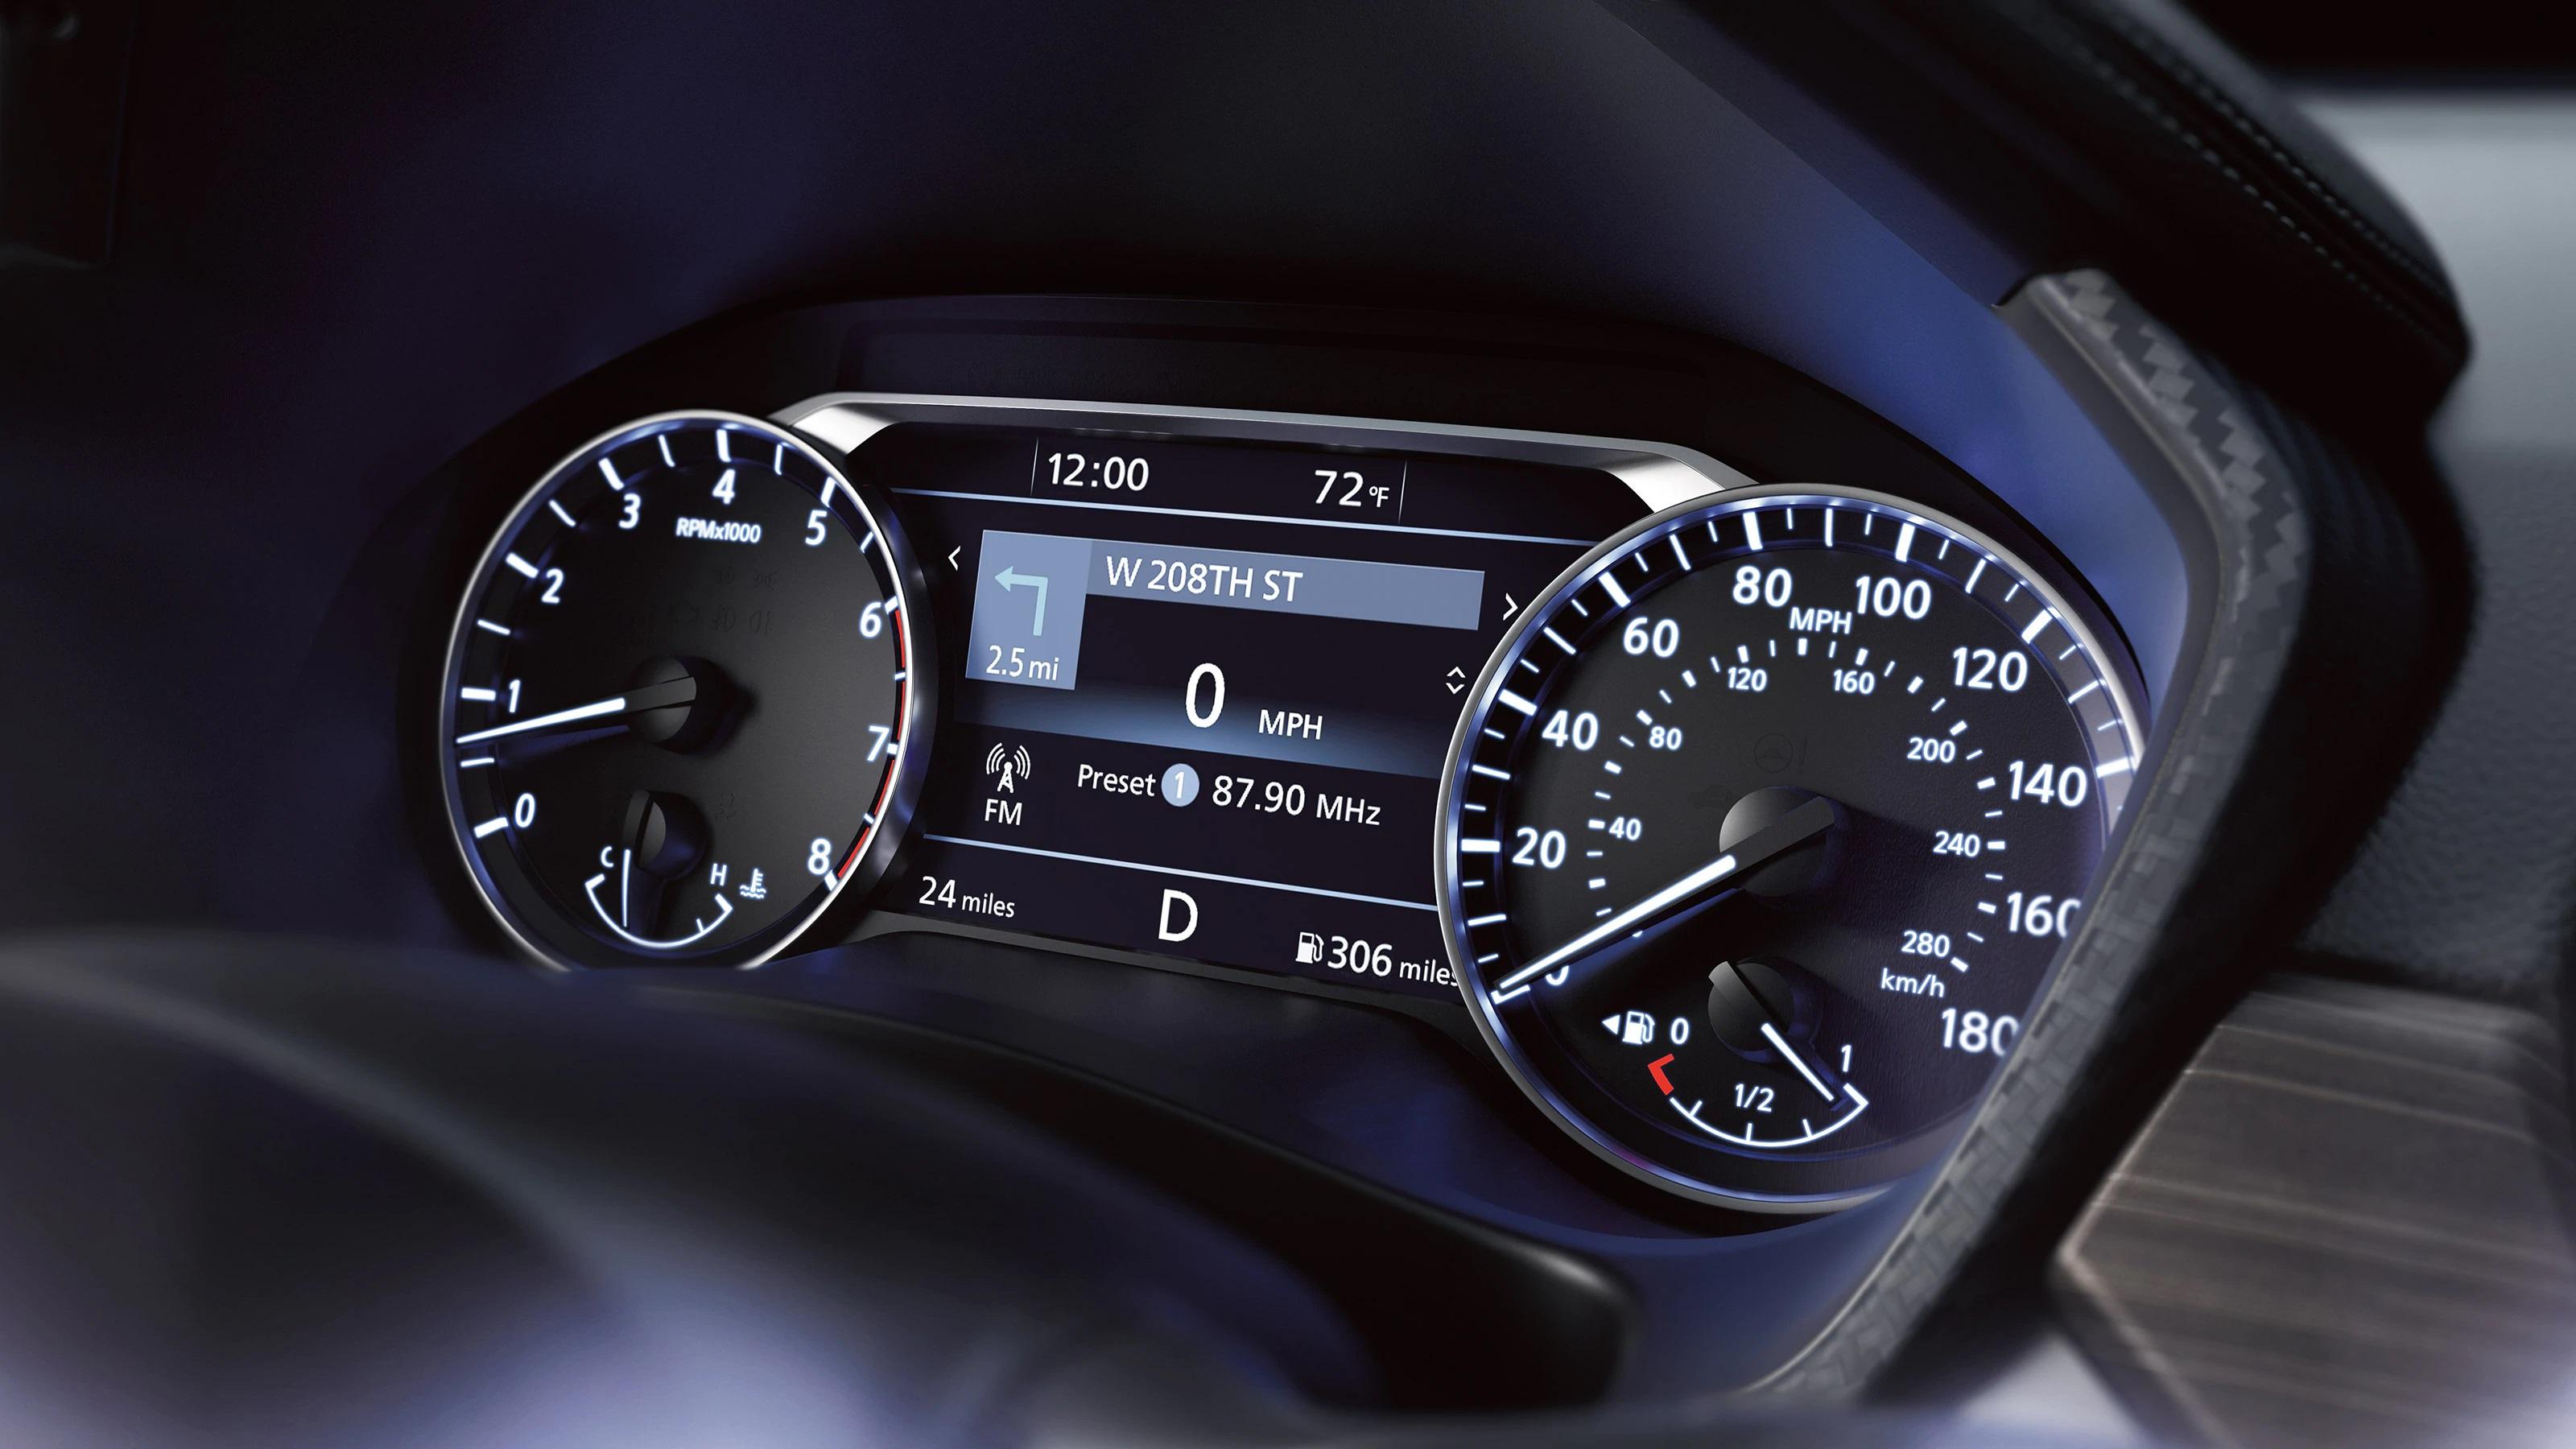 2020 Nissan Altima Information Display